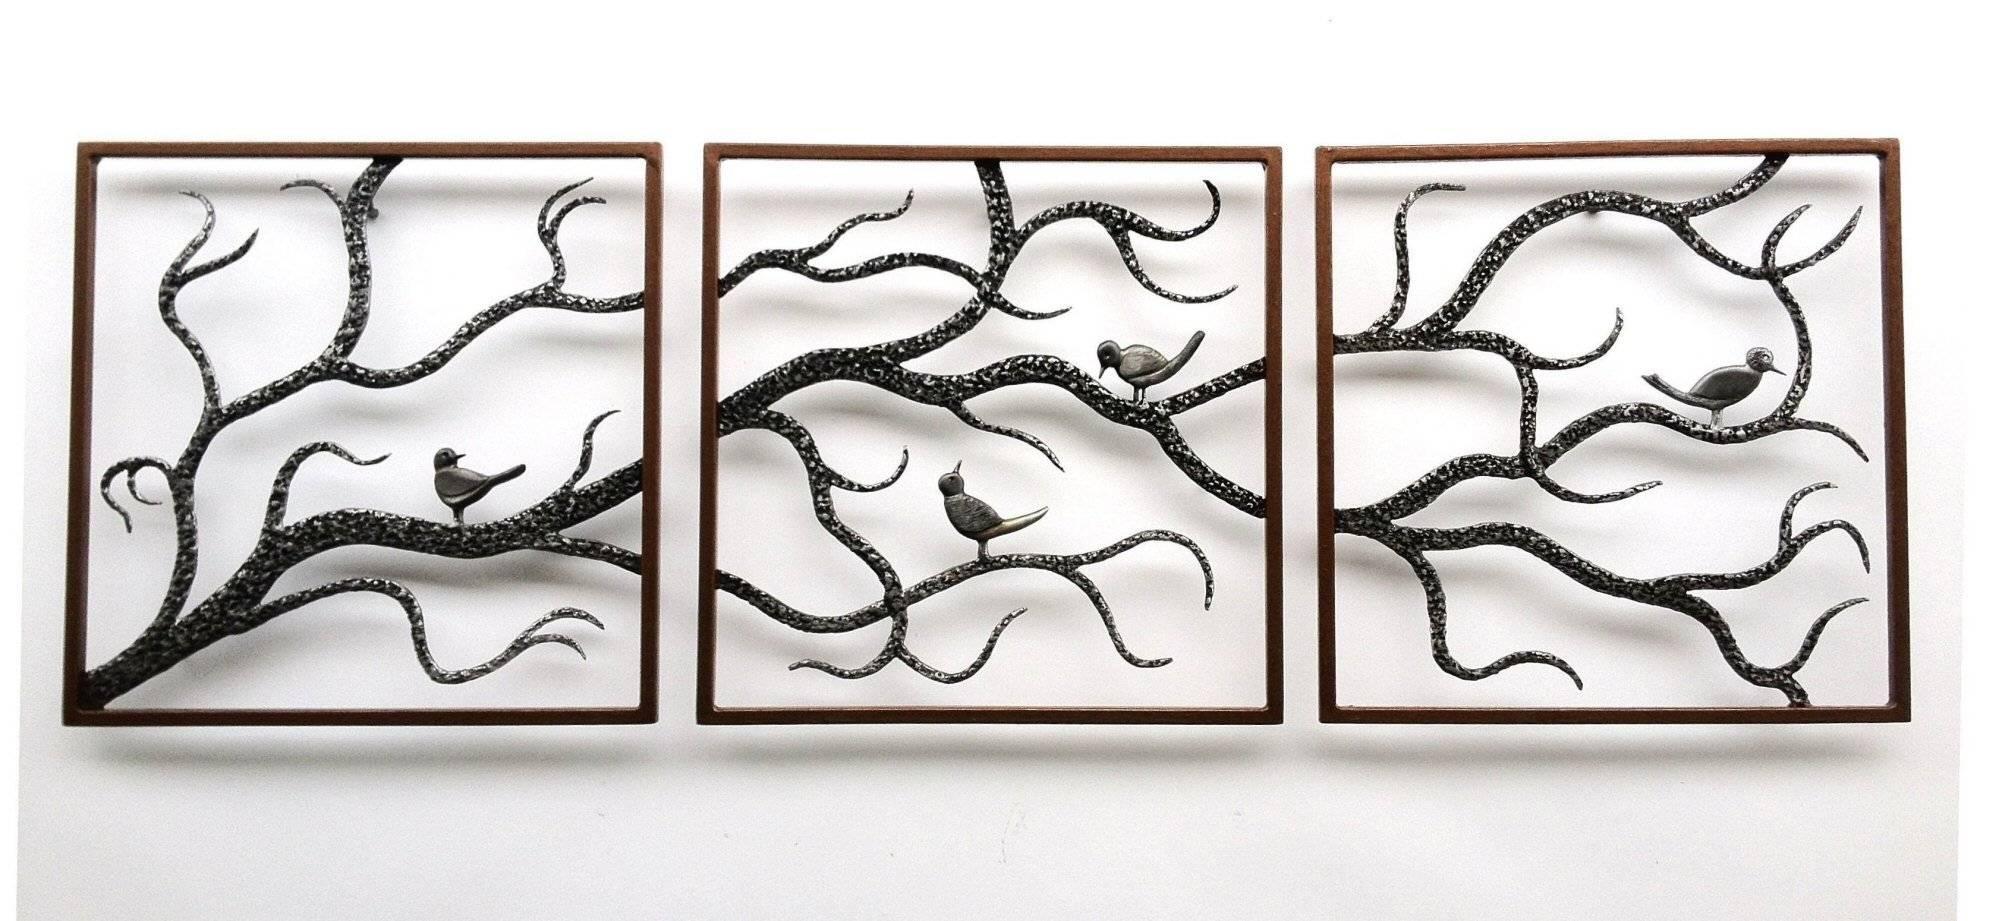 Wall Art Designs: Metal Wall Art Trees Birch Three Framed Cute With Newest Oak Tree Metal Wall Art (View 22 of 30)